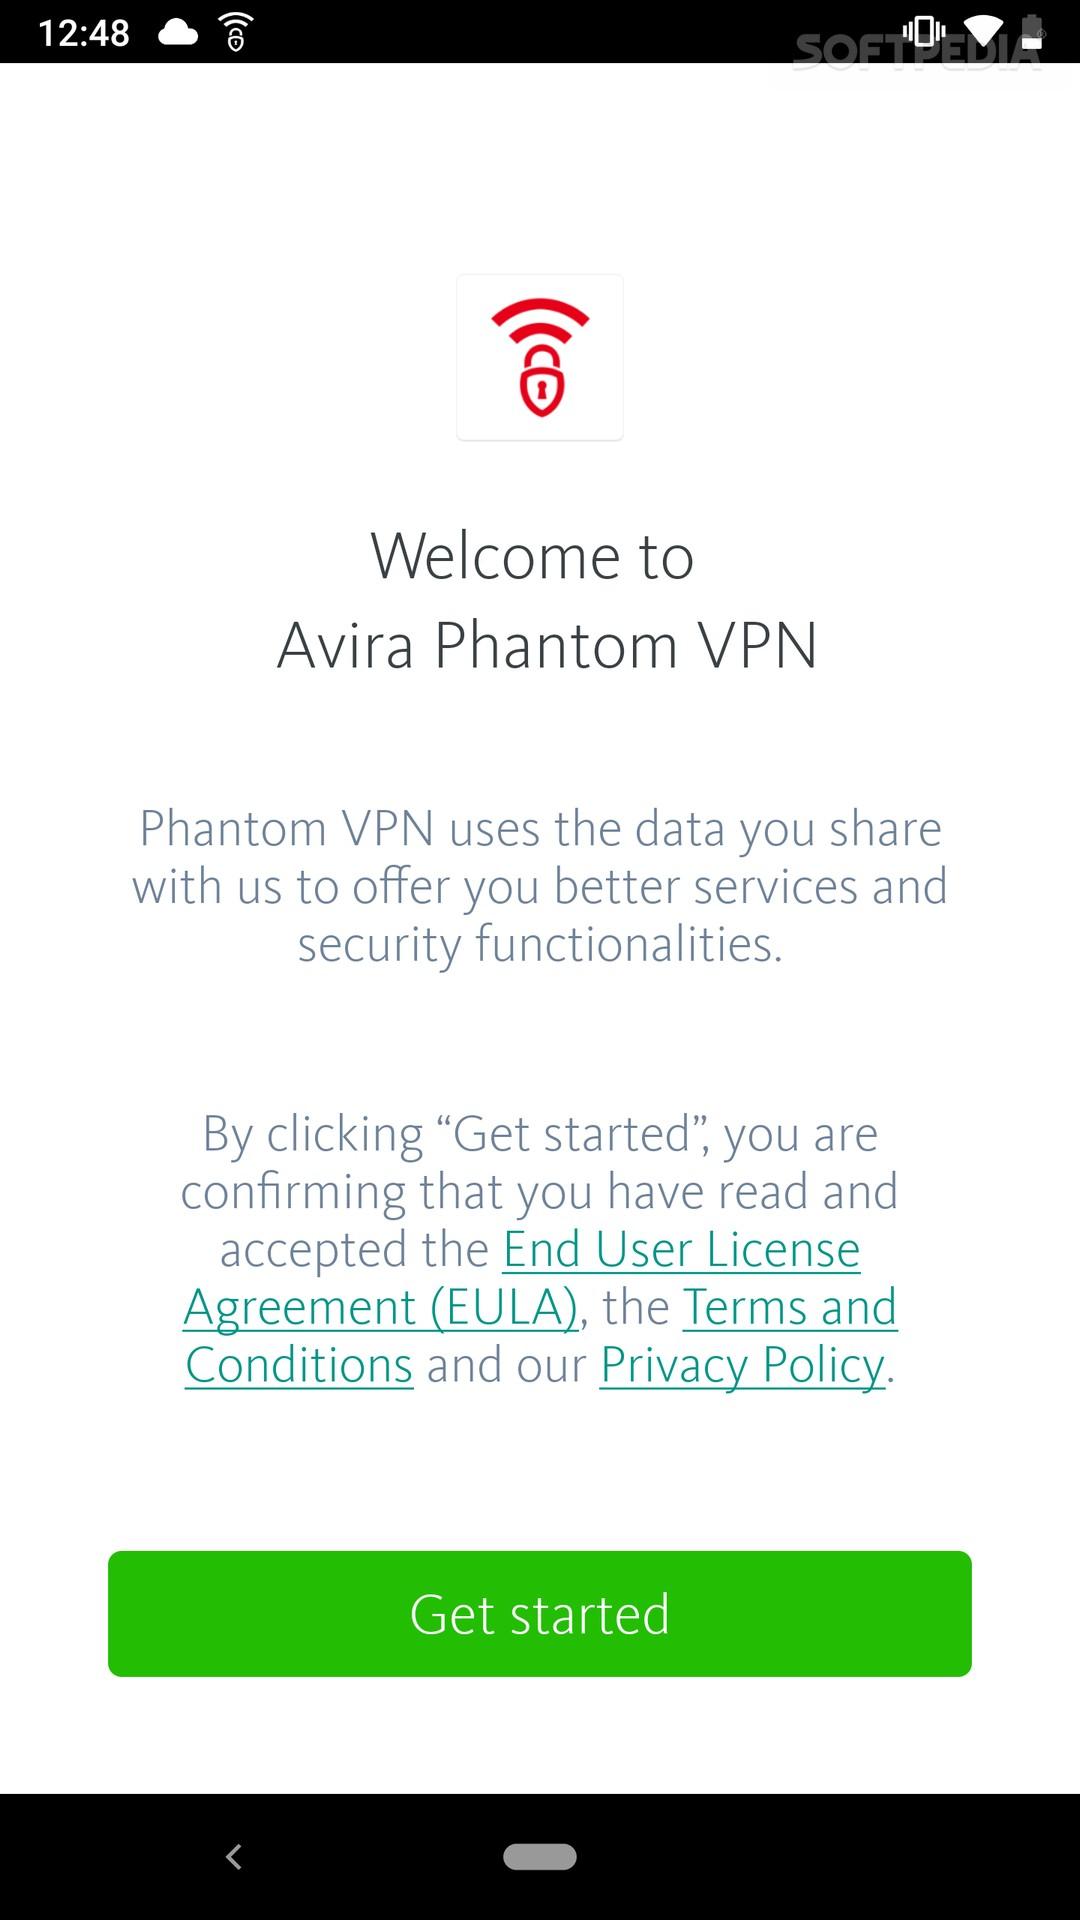 Avira Phantom VPN 2 0 9 APK Download